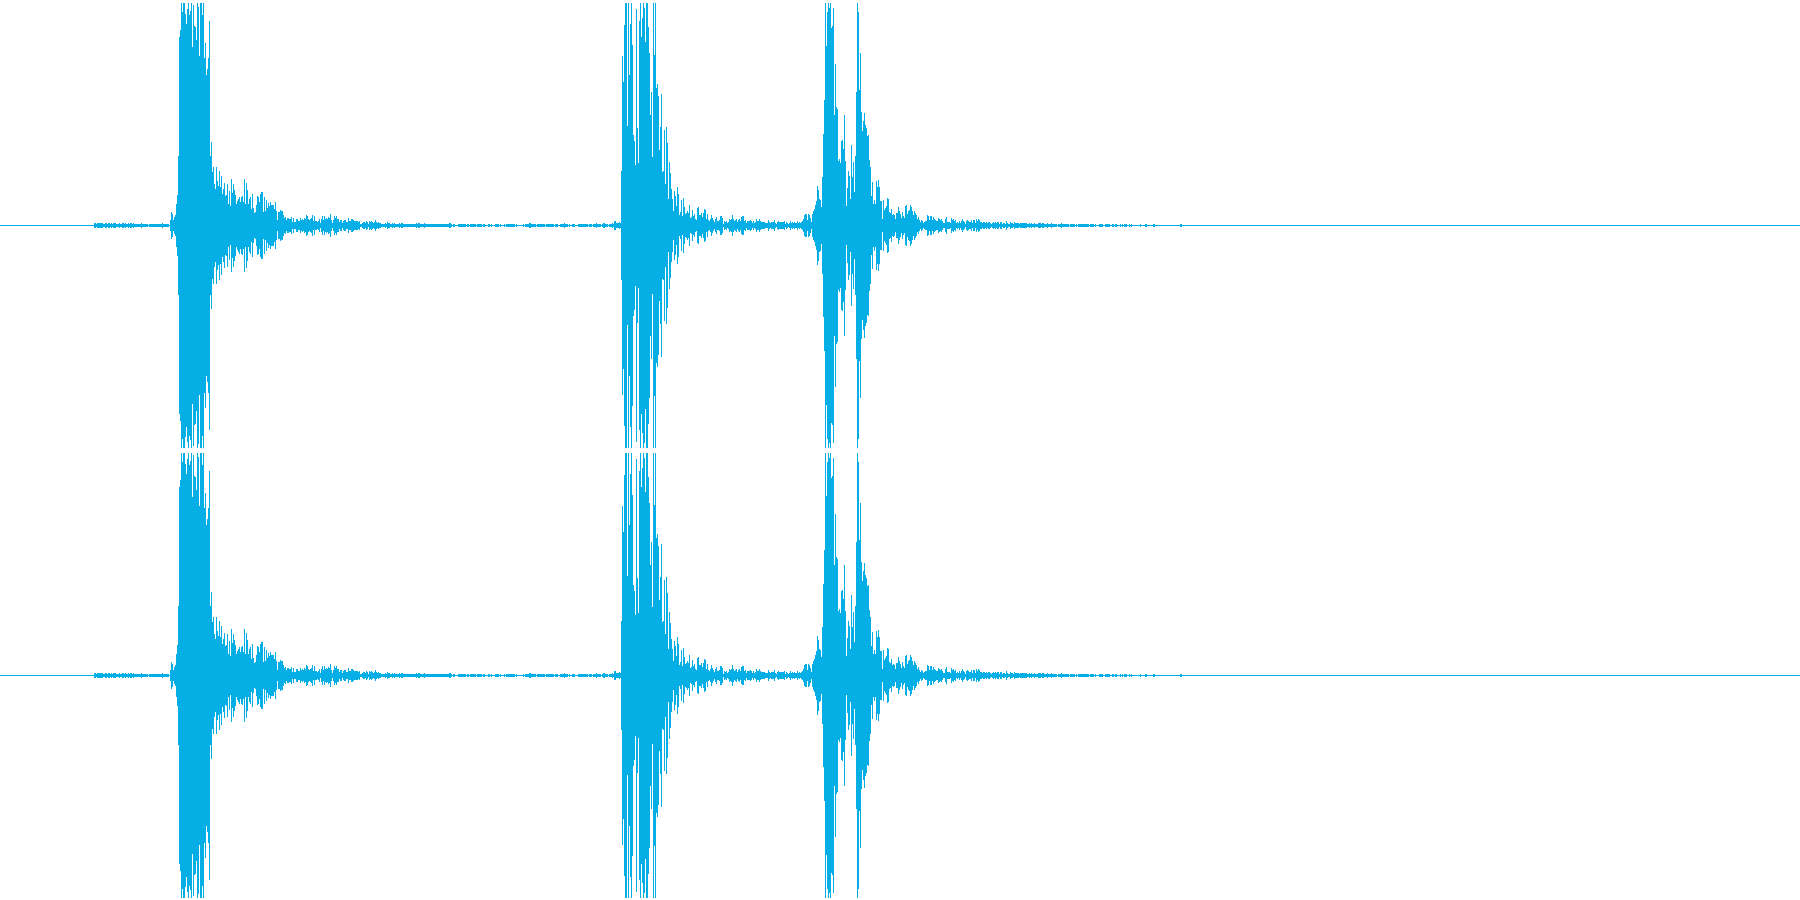 Typing キーボード 連打音の再生済みの波形